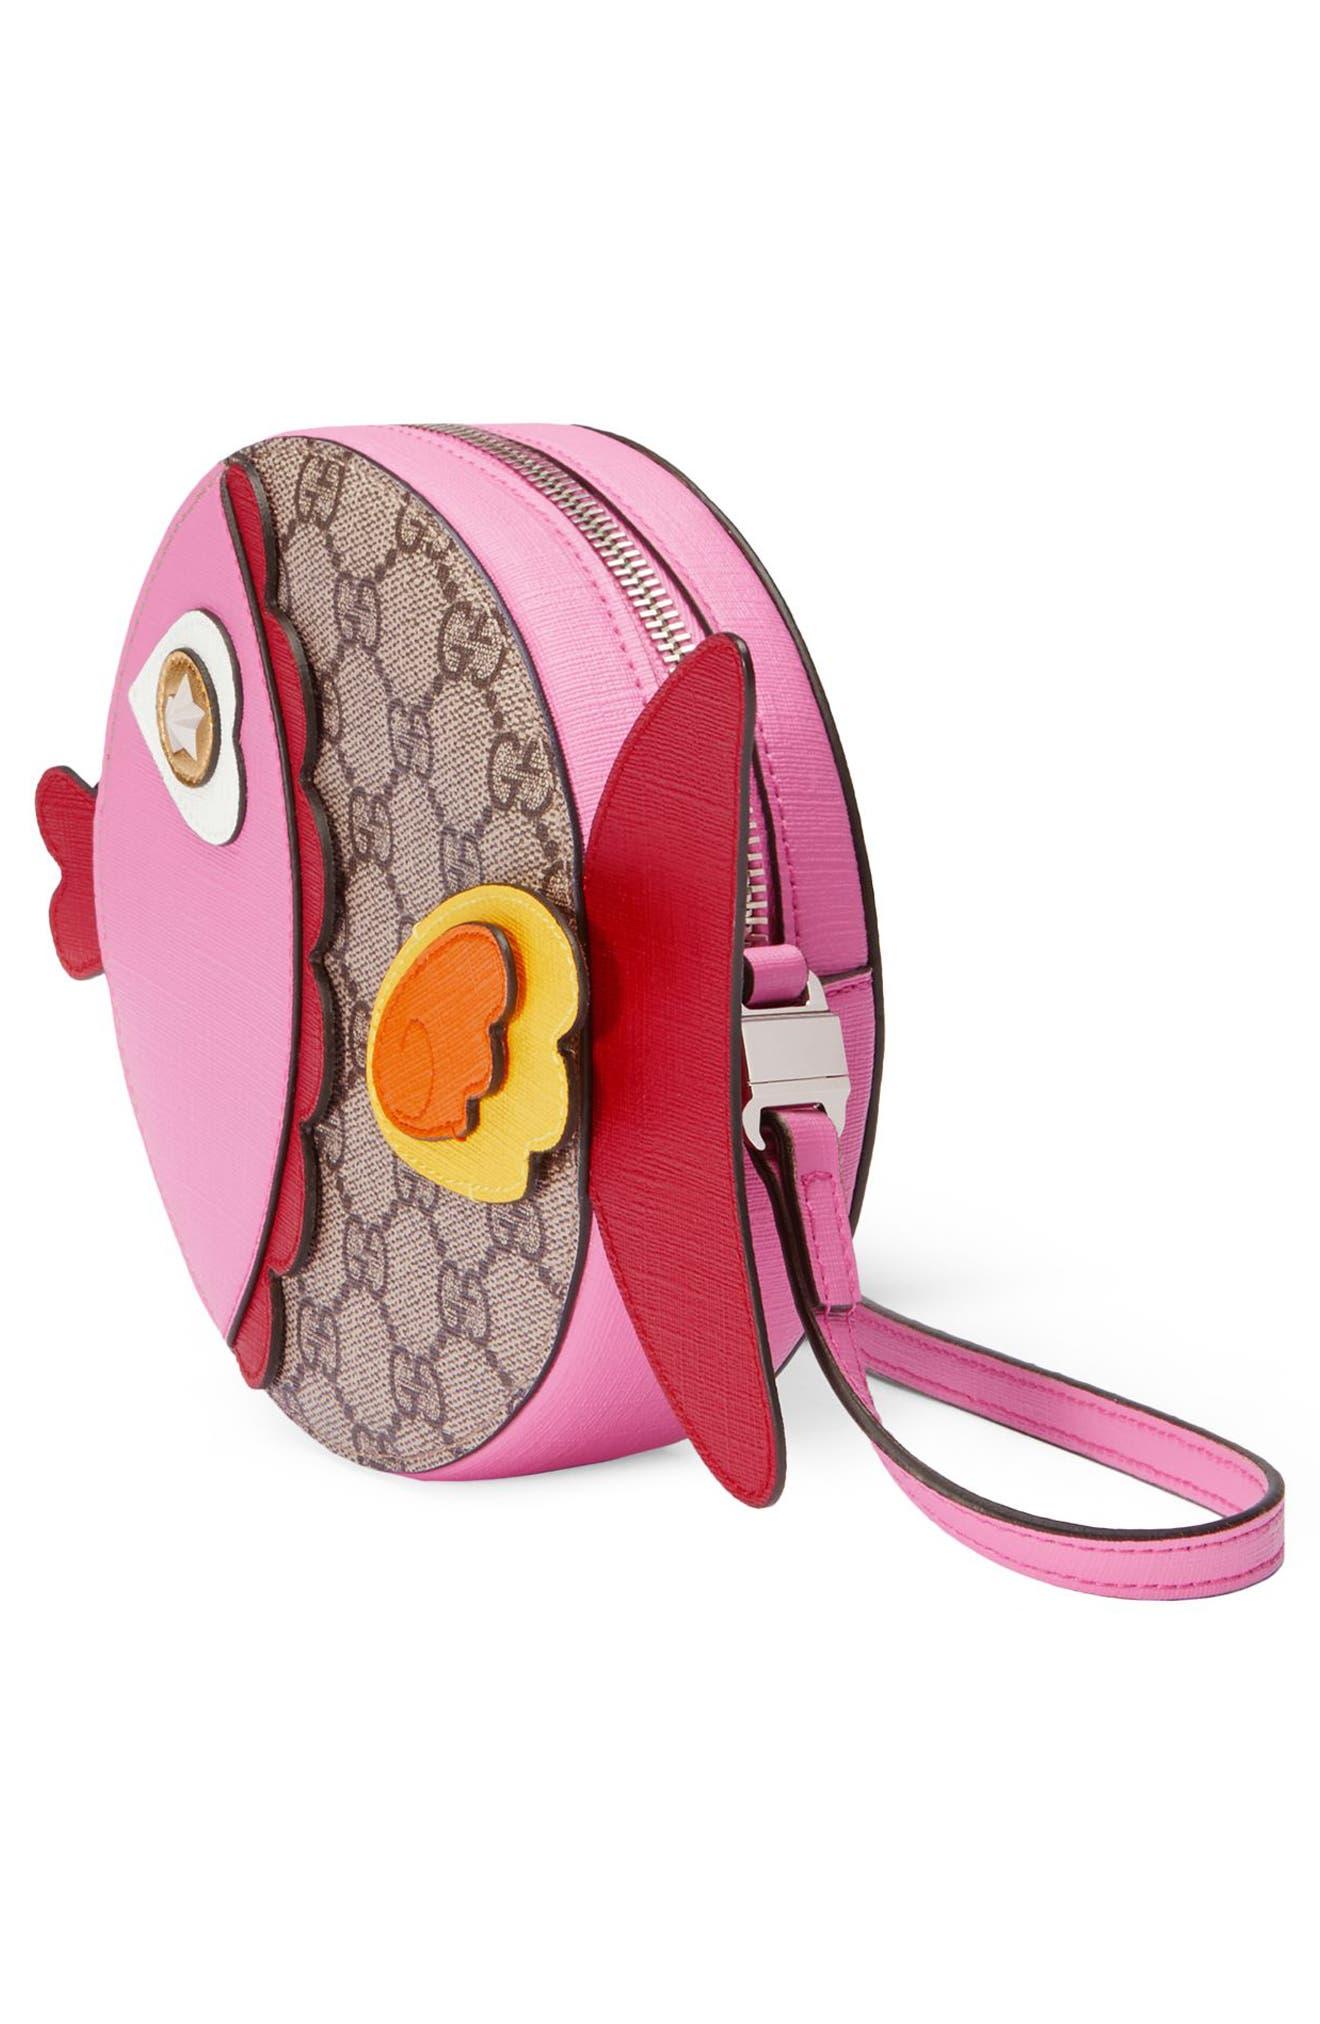 Gucci GG Supreme Fish Canvas Shoulder Bag,                             Alternate thumbnail 4, color,                             204